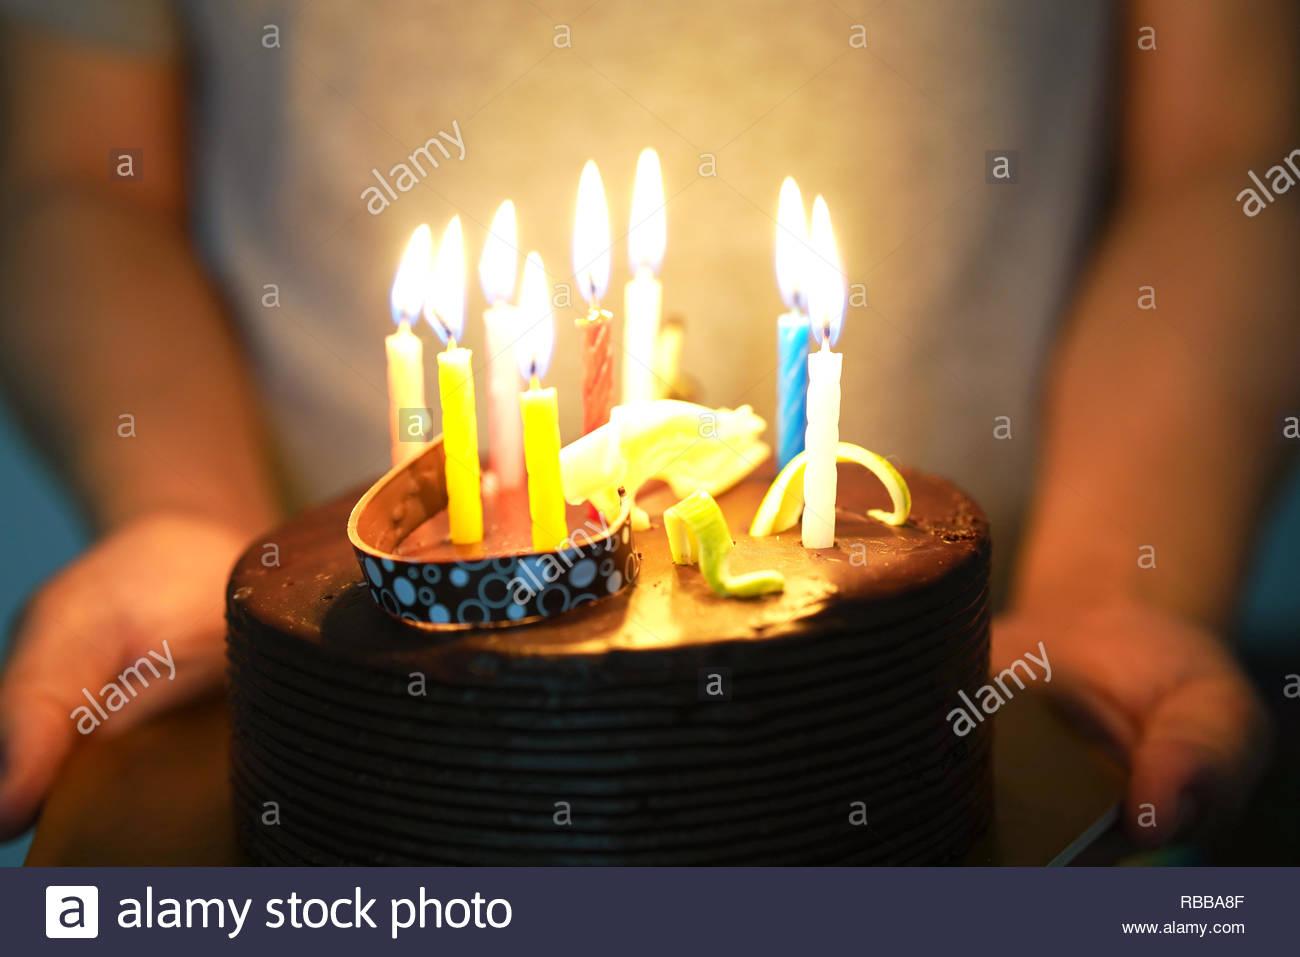 Incredible Birthday Chocolate Cake On Human Hand Stock Photo 230745551 Alamy Personalised Birthday Cards Petedlily Jamesorg